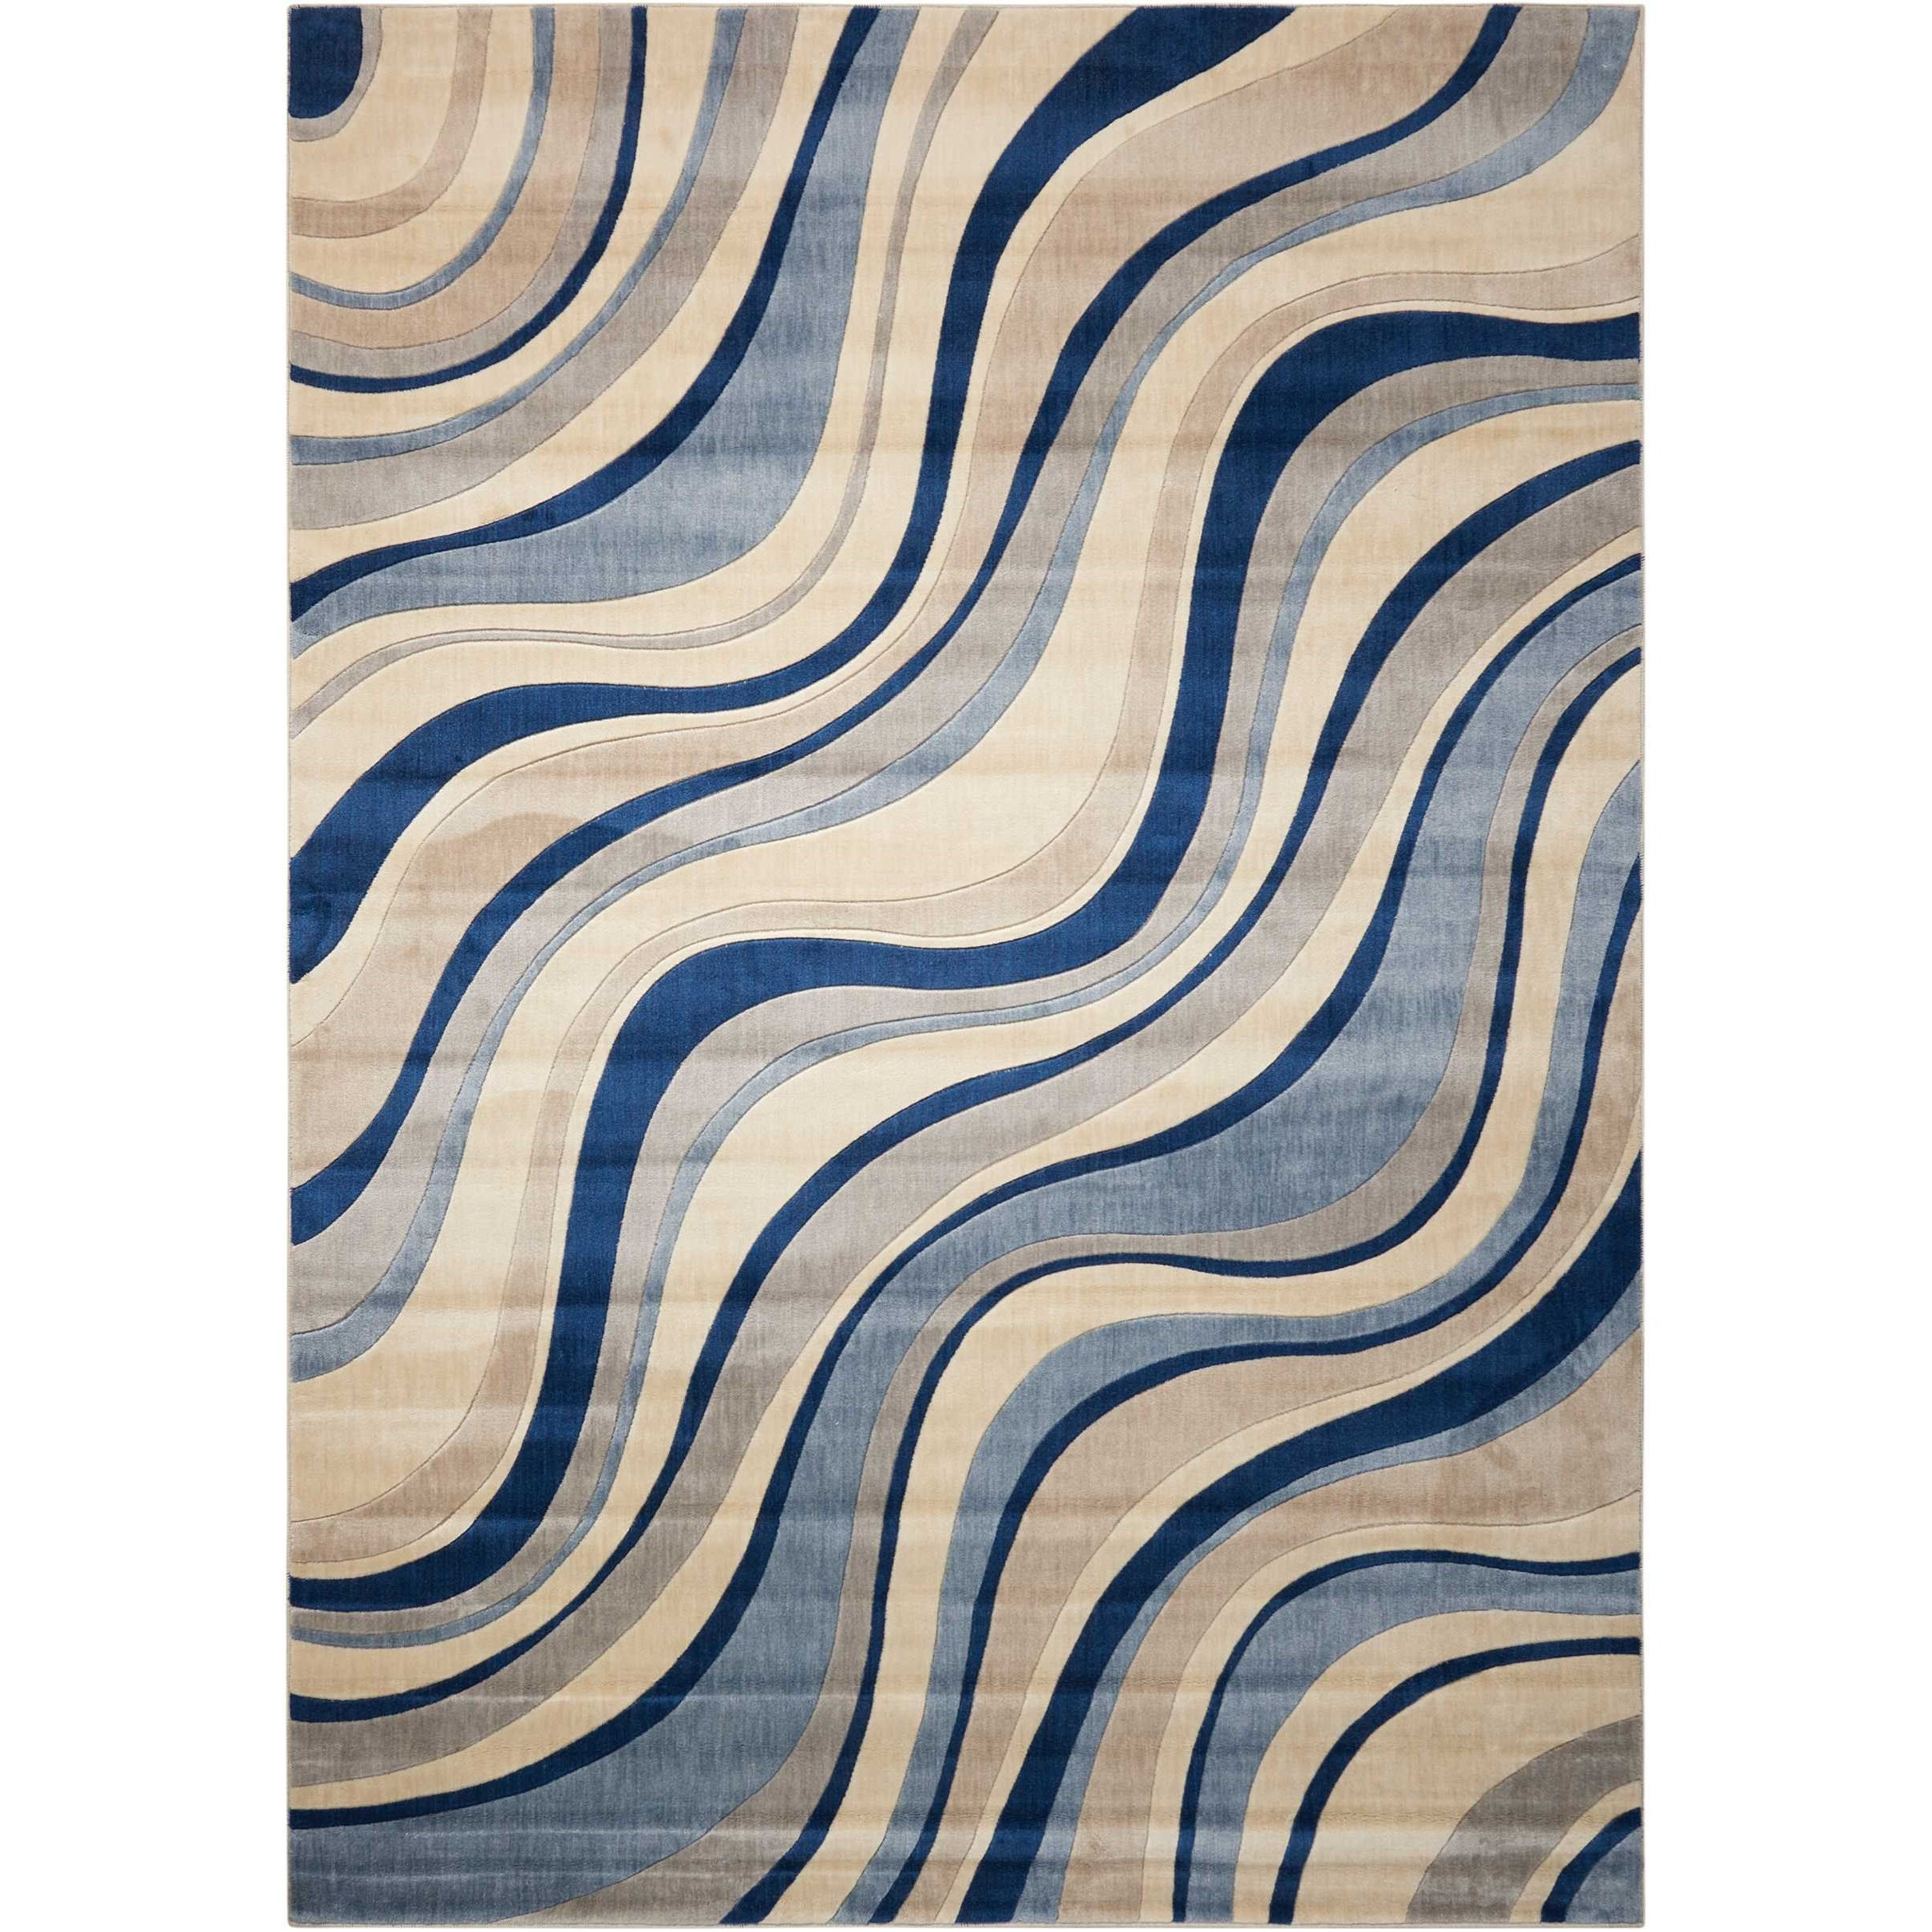 "9'6"" x 13' Ivory Blue Rectangle Rug"